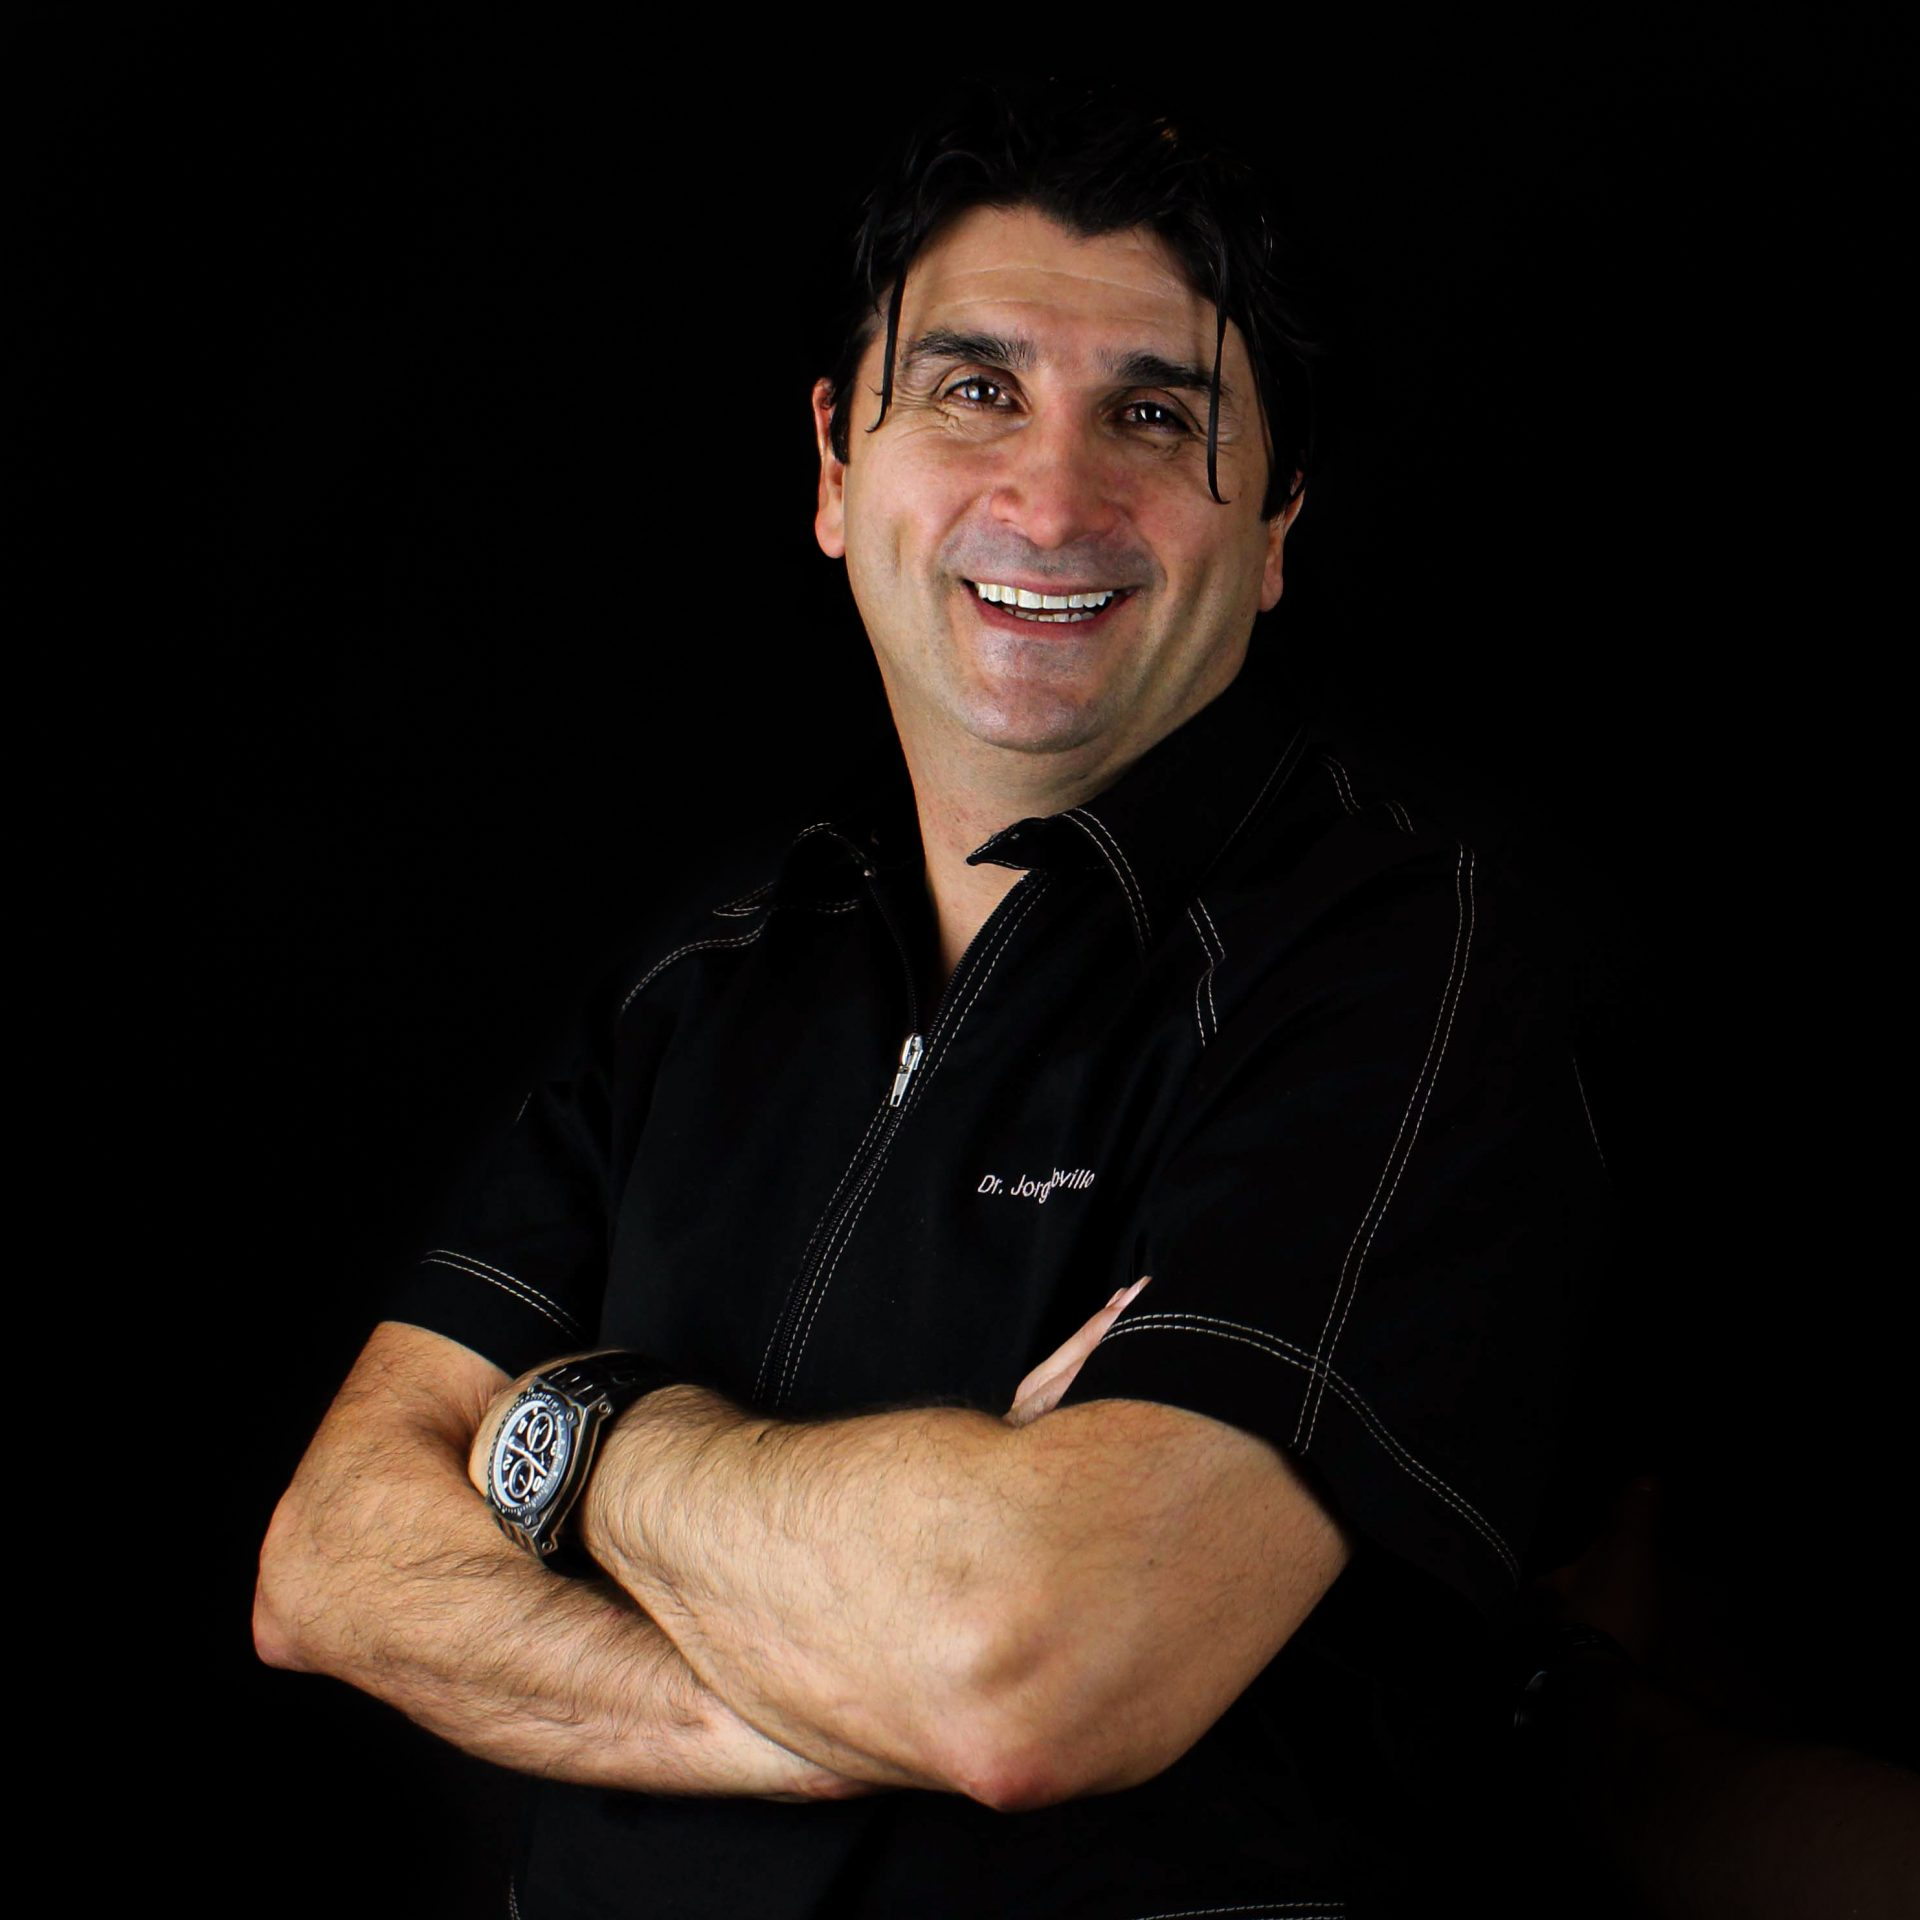 Dr. Jorge Novillo